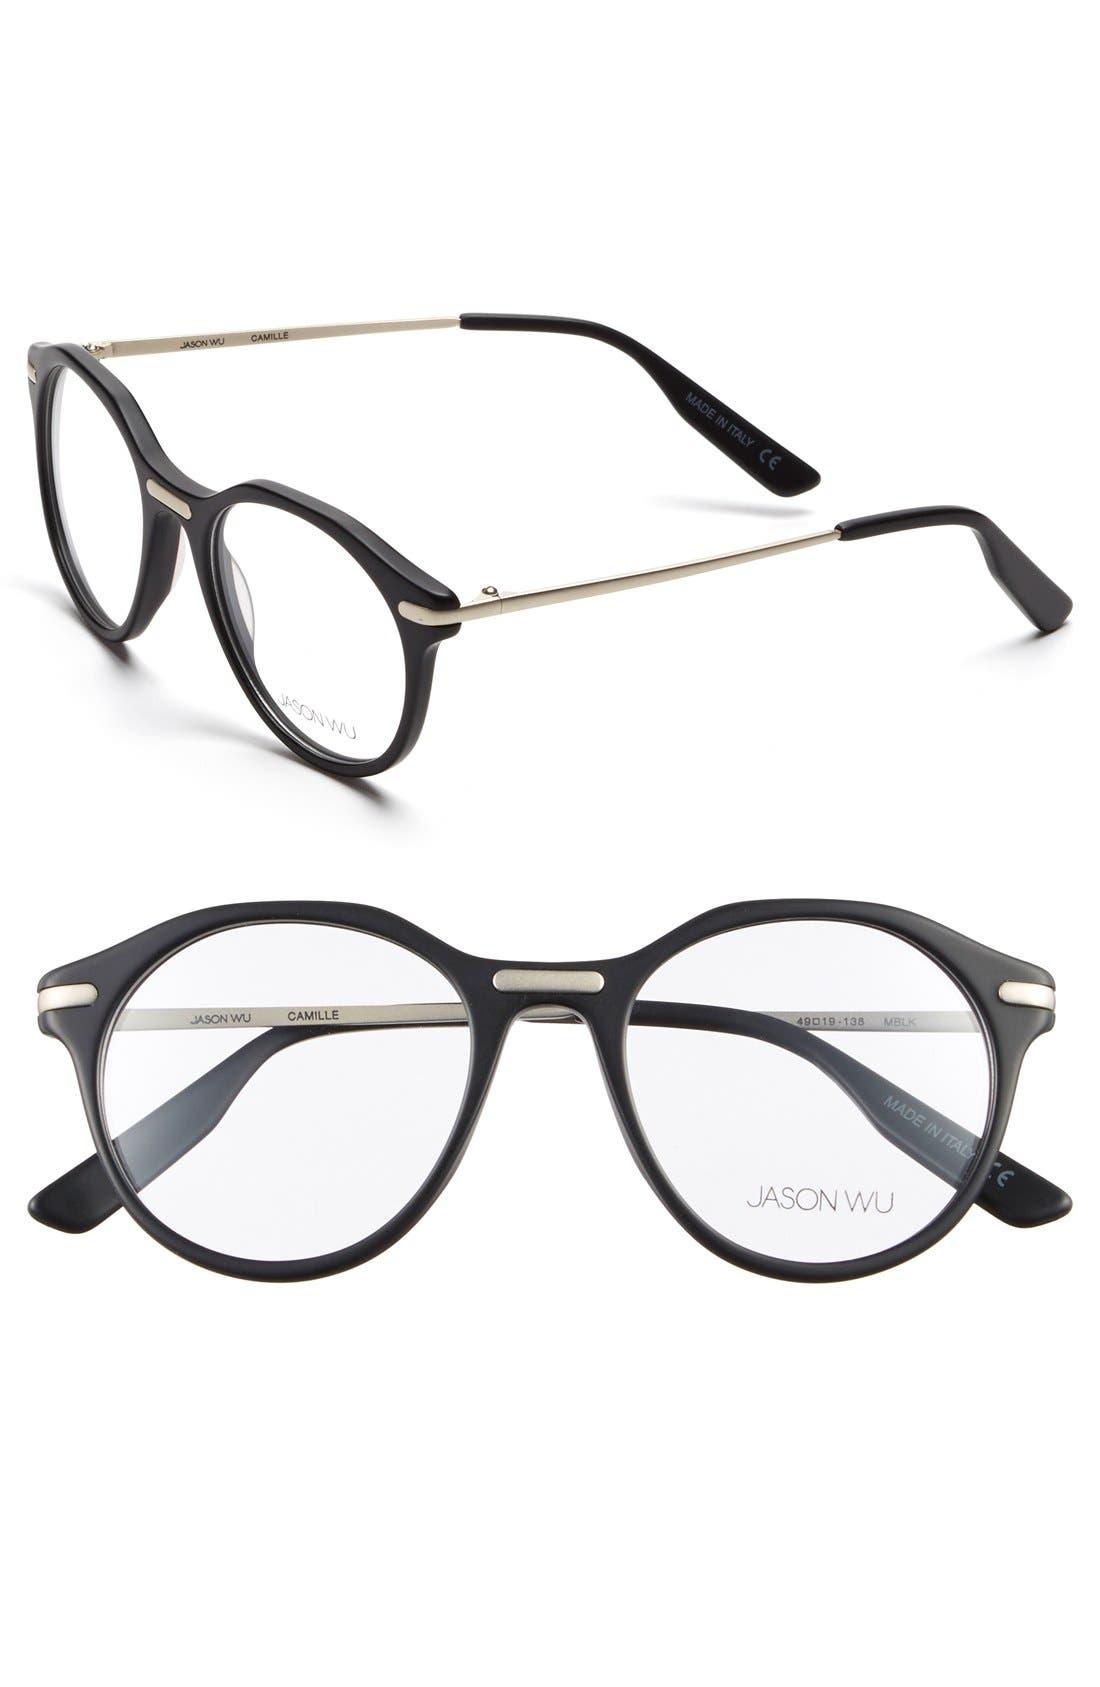 Main Image - Jason Wu 'Camille' 49mm Optical Glasses